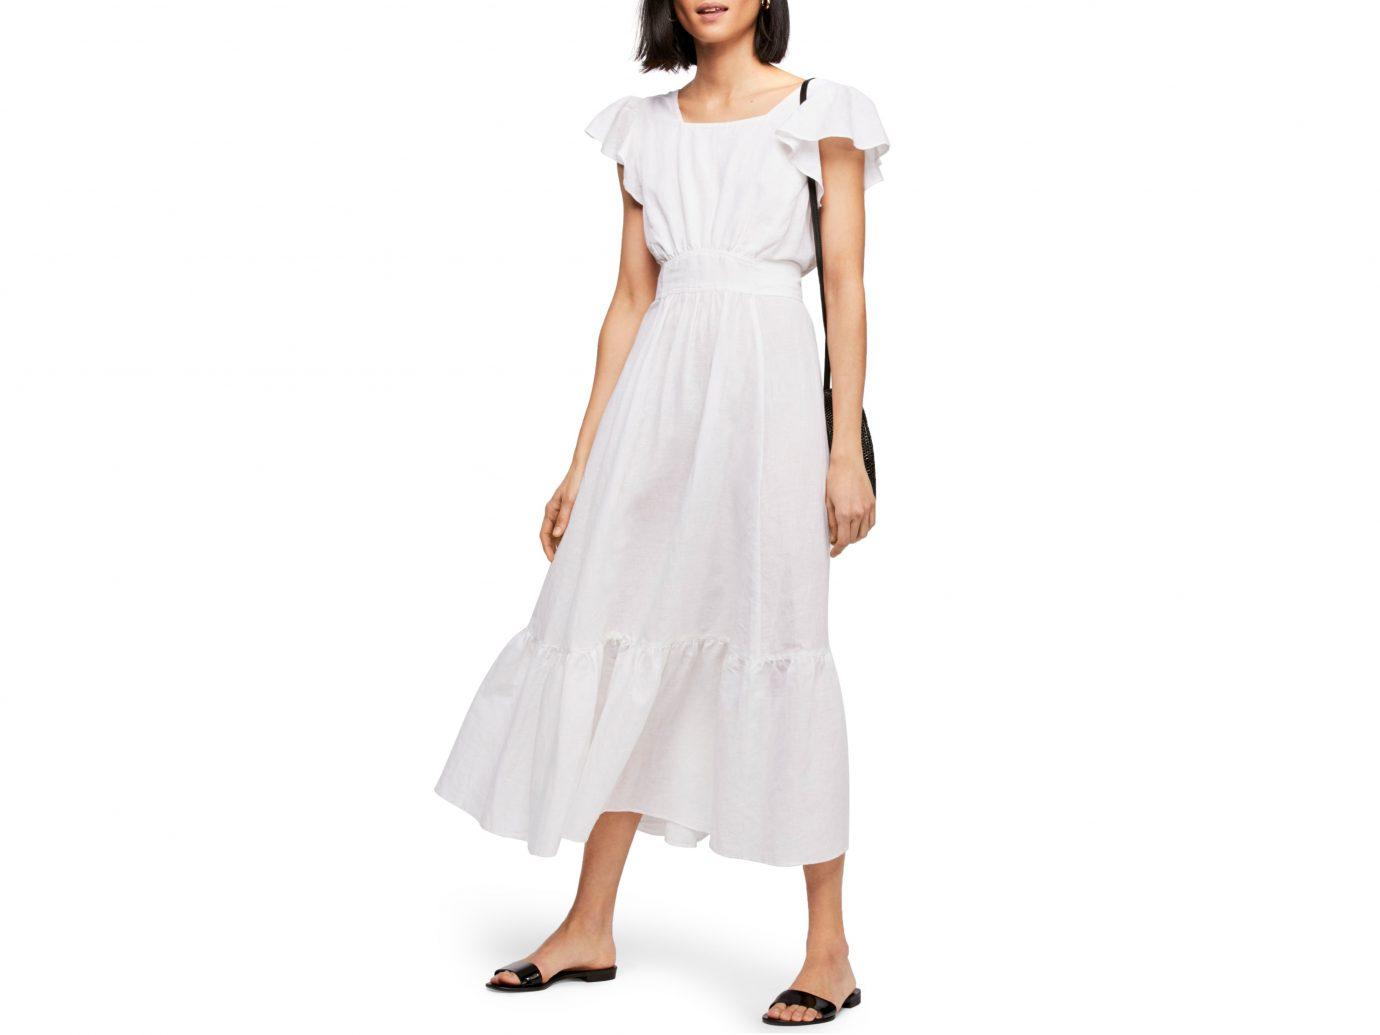 Free People Endless Summer Takin' a Chance Midi Dress